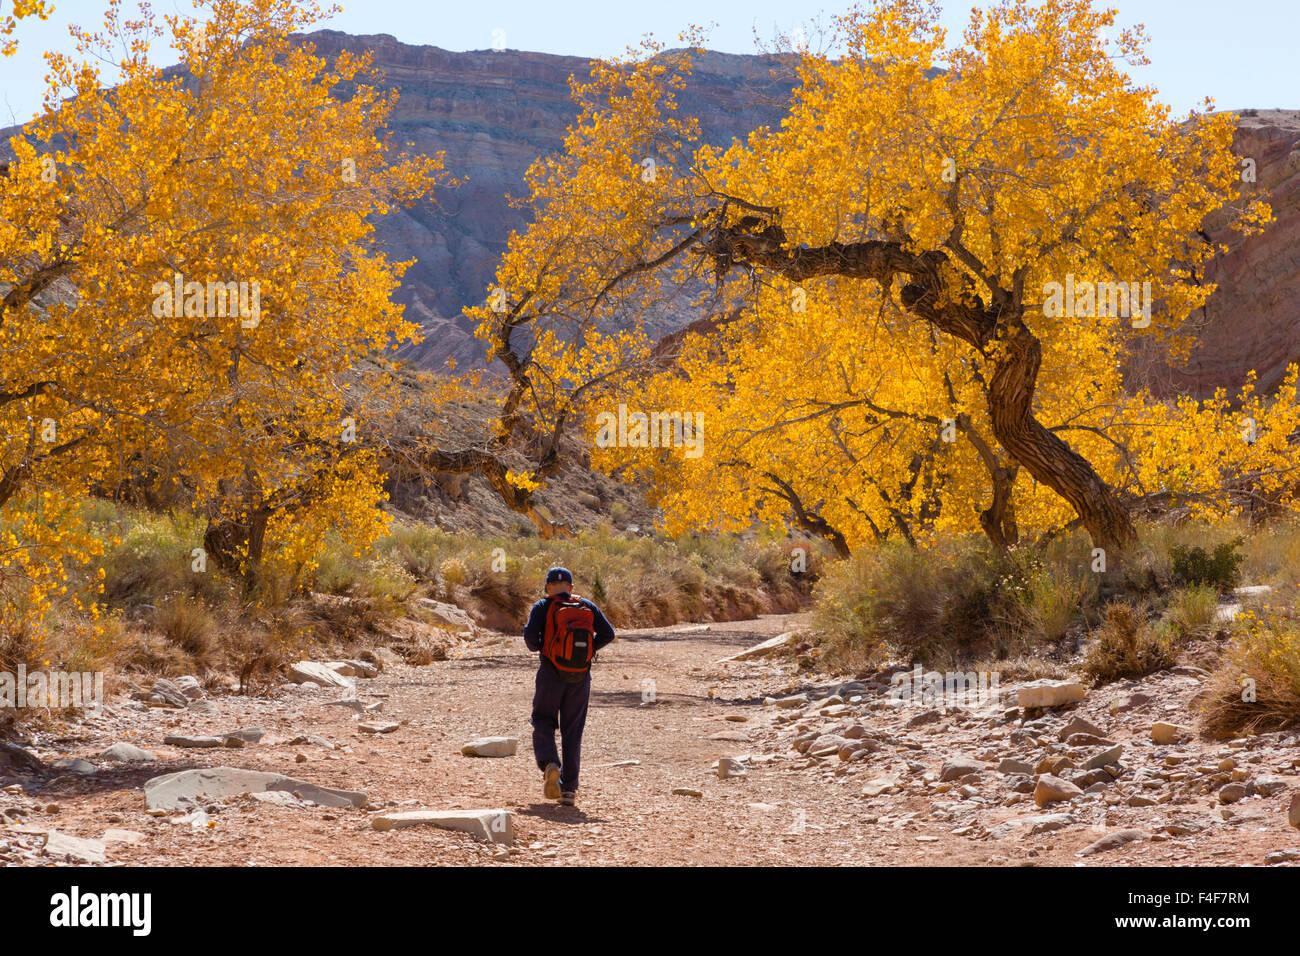 USA, Utah, Emery, Cottonwood Trees. - Stock Image